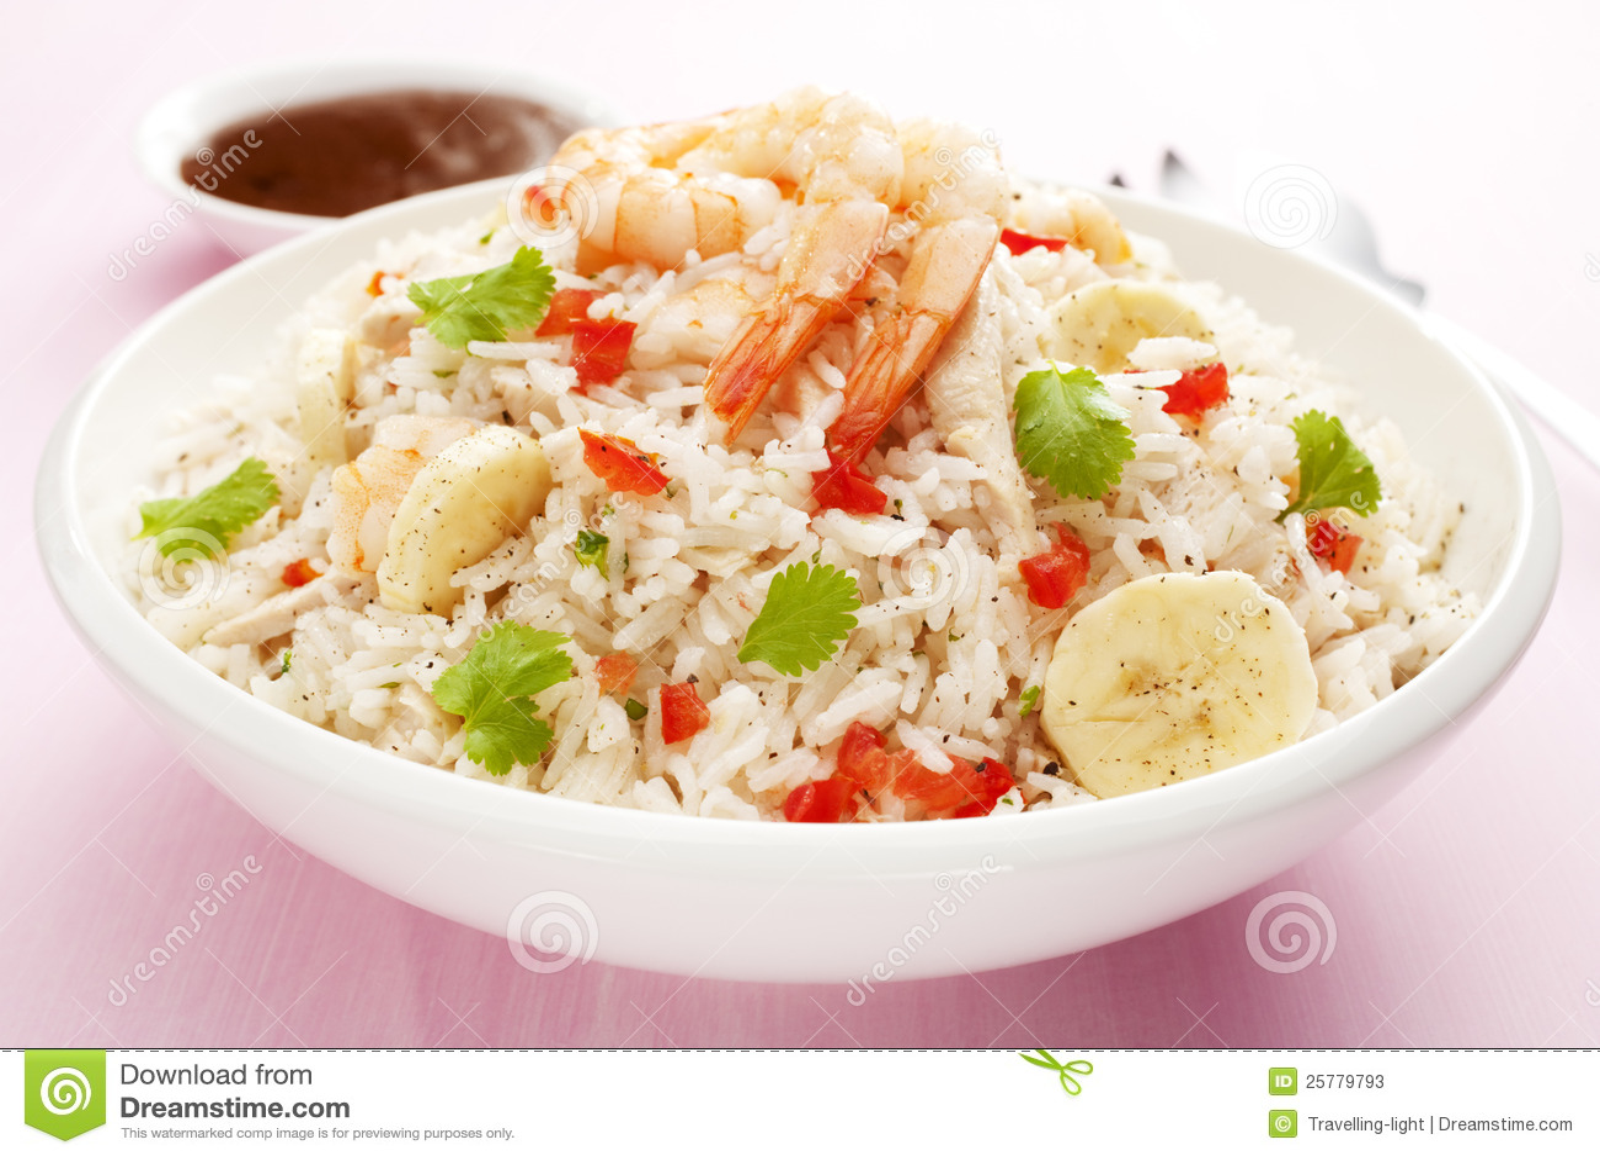 Rice Salad with Prawn or Shrimp and Banana